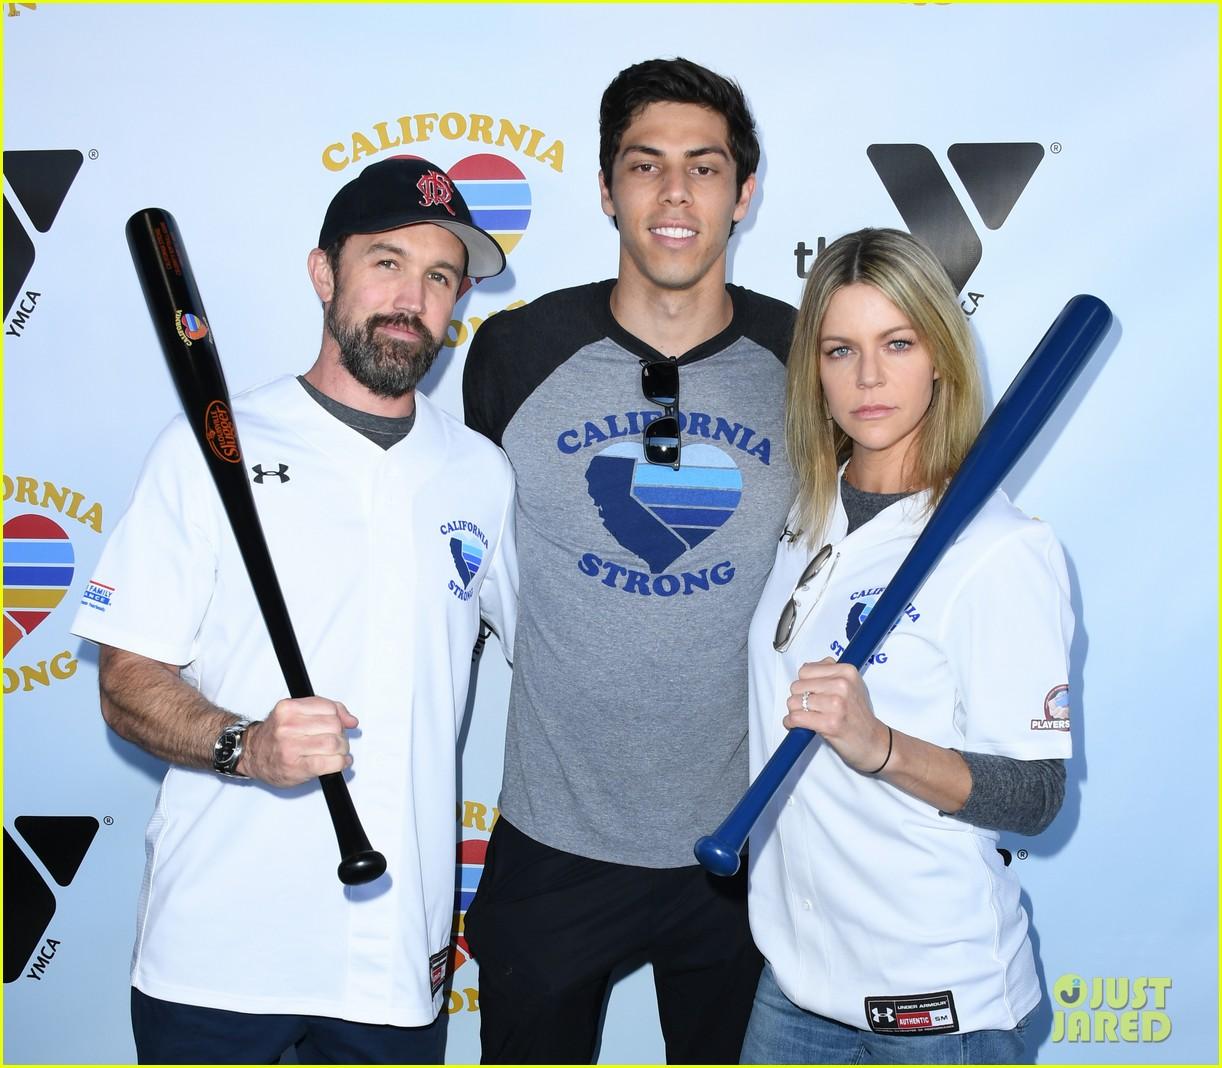 adam sandler colton underwood more team up for celebrity softball benefit game 104415343